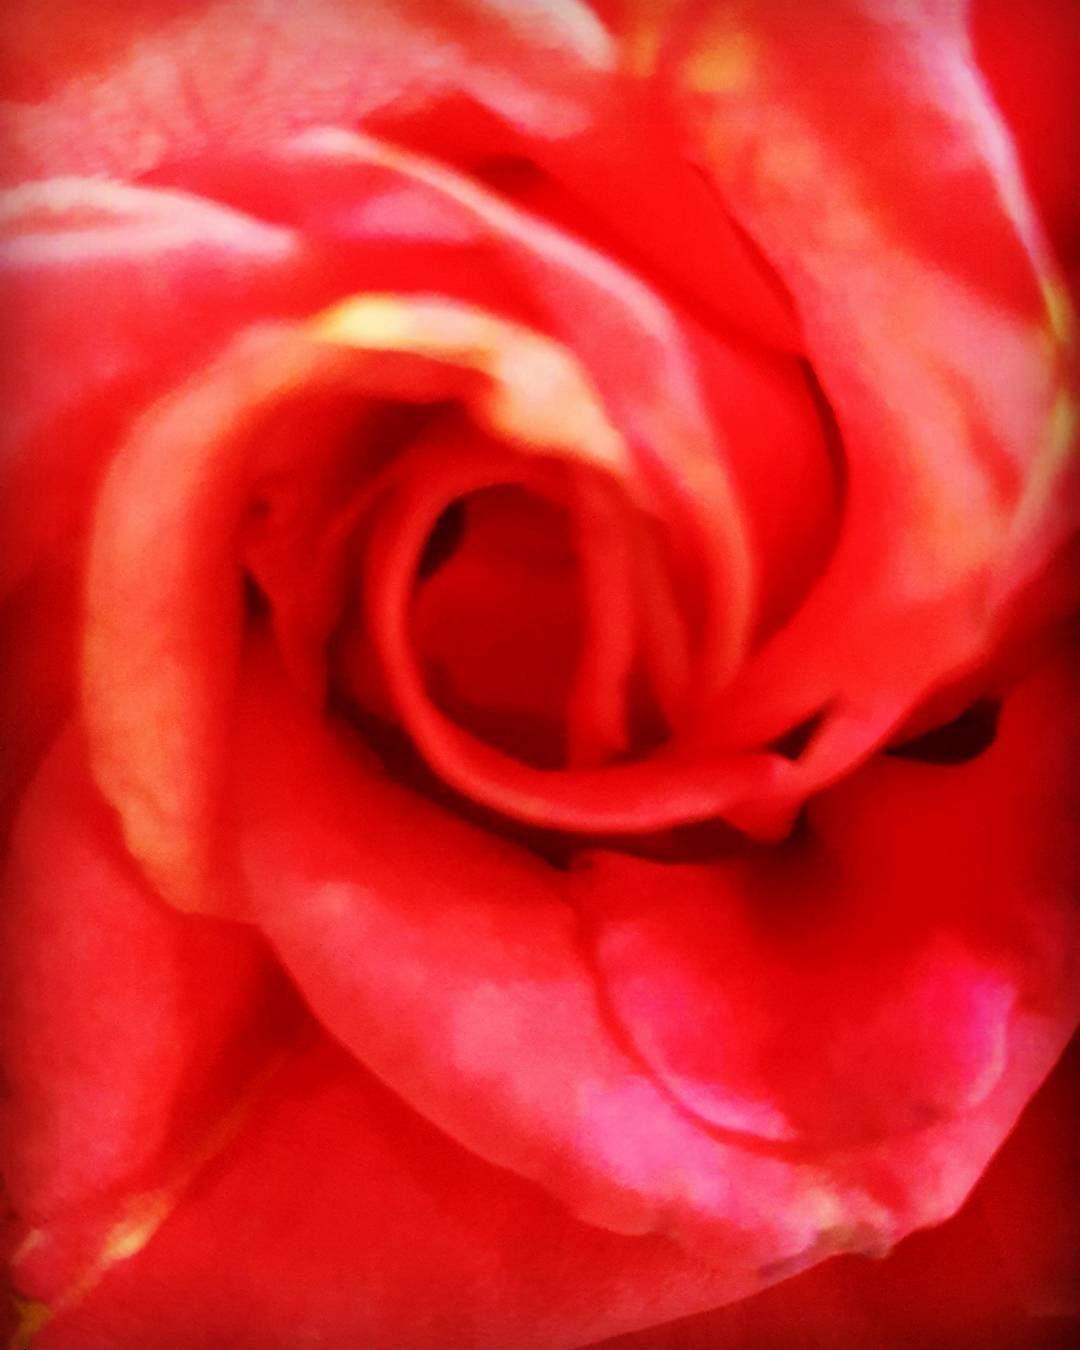 #gardening  #blossom  #flower  #flowerslovers  #flowers #photography #macrophotography  #macrophoto #rose  #roses�� http://gelinshop.com/ipost/1514930165011207249/?code=BUGHPVpBFRR